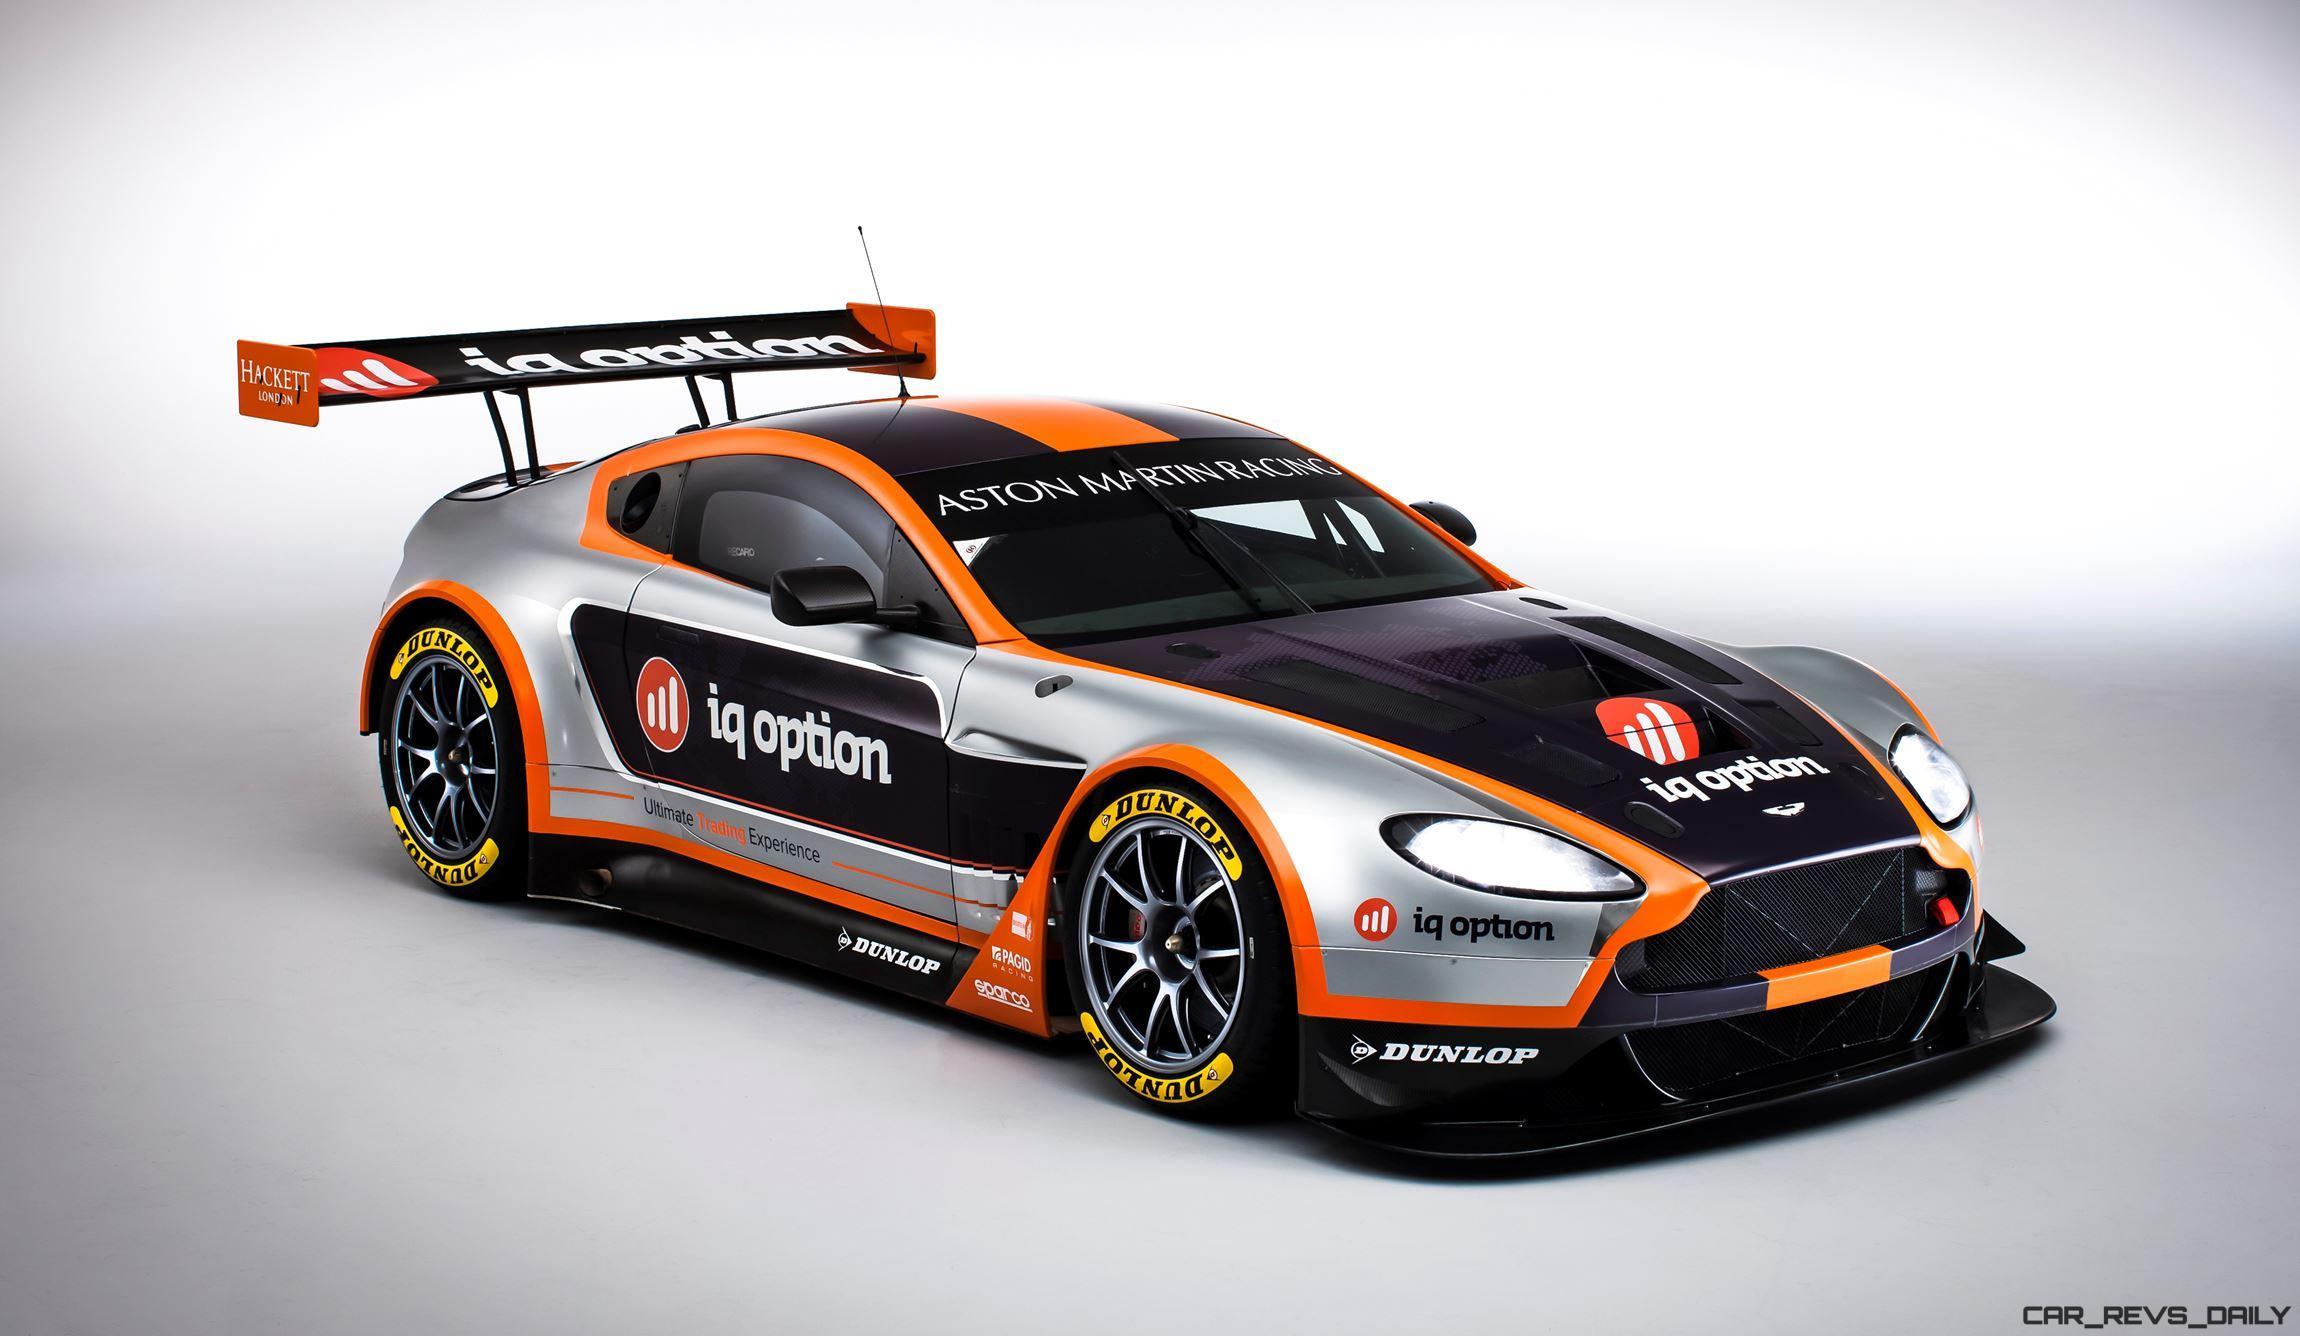 Aston Martin Vantage Gte Complements Racecars Dismal